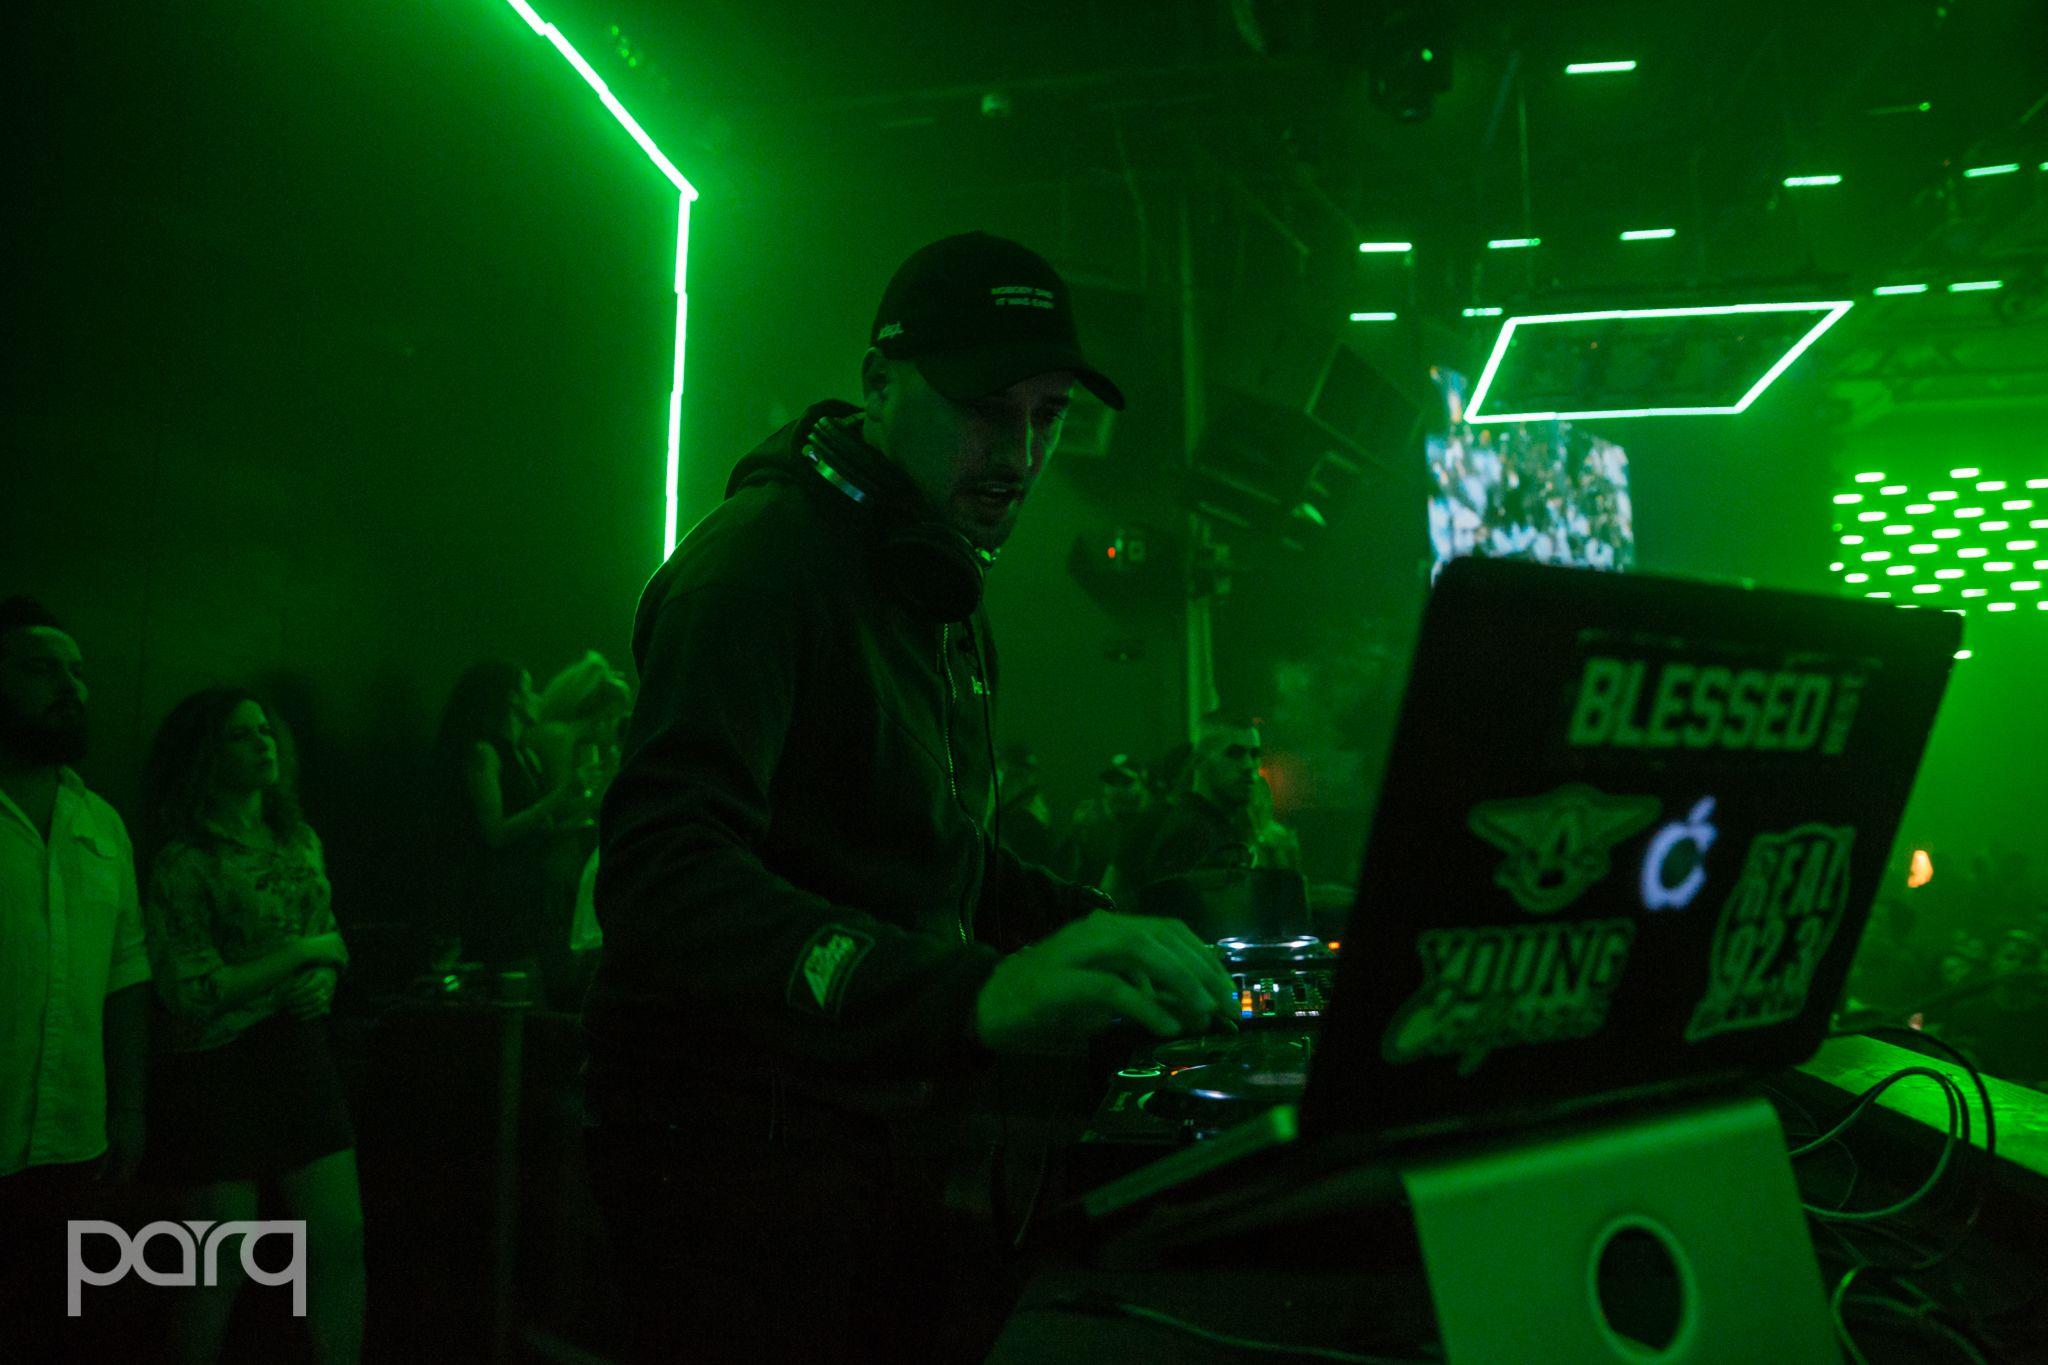 09.27.18 Parq - DJ Khaled-11.jpg